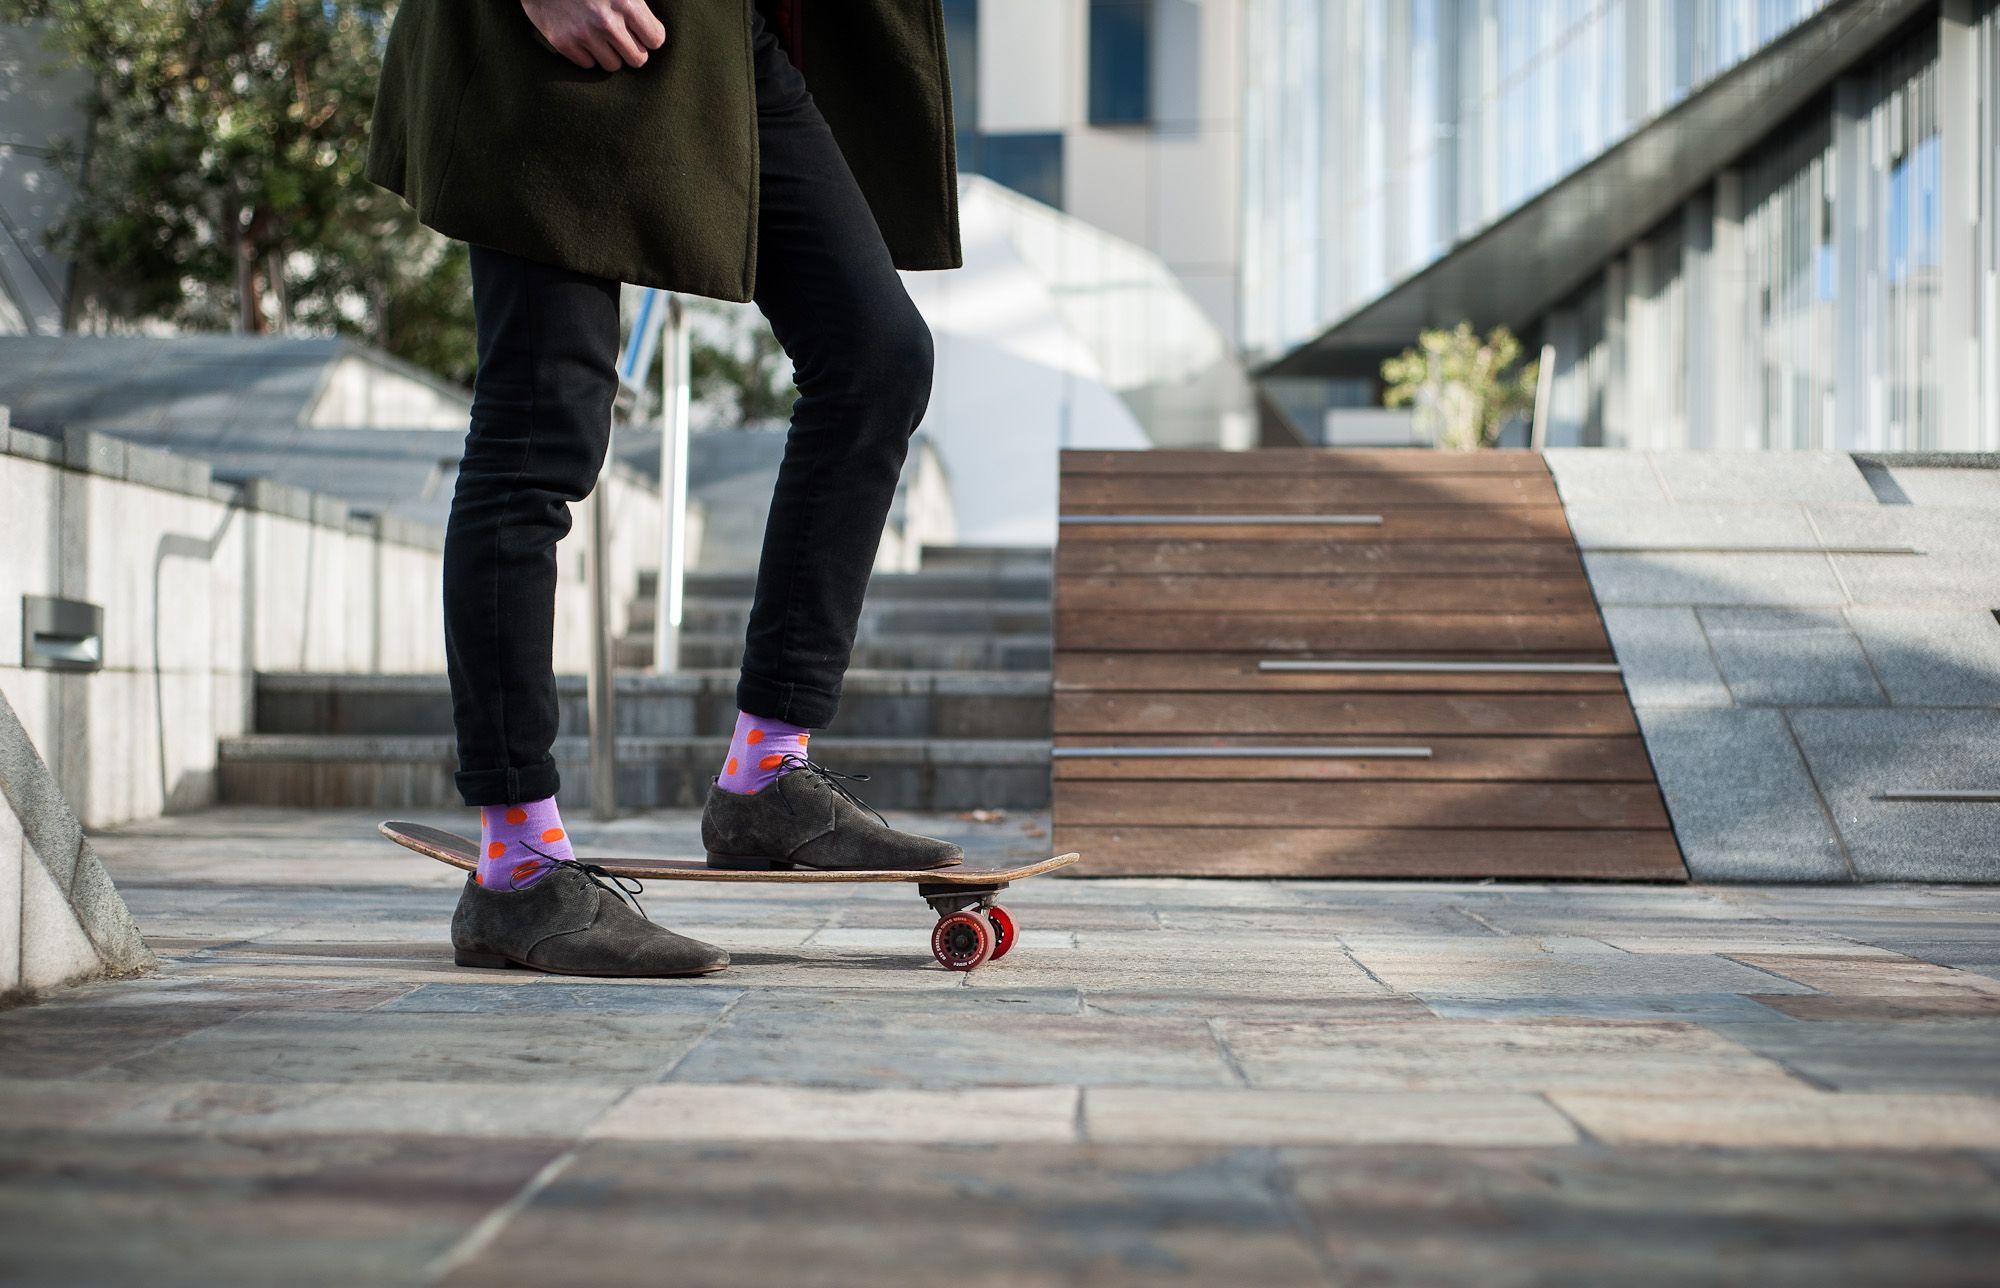 Spot Sock purple & orange from online men's fashion shop www.rockmysocks.com. Great range of patterned coloured unique men's socks. Free shipping to Australia, only five dollars international post.